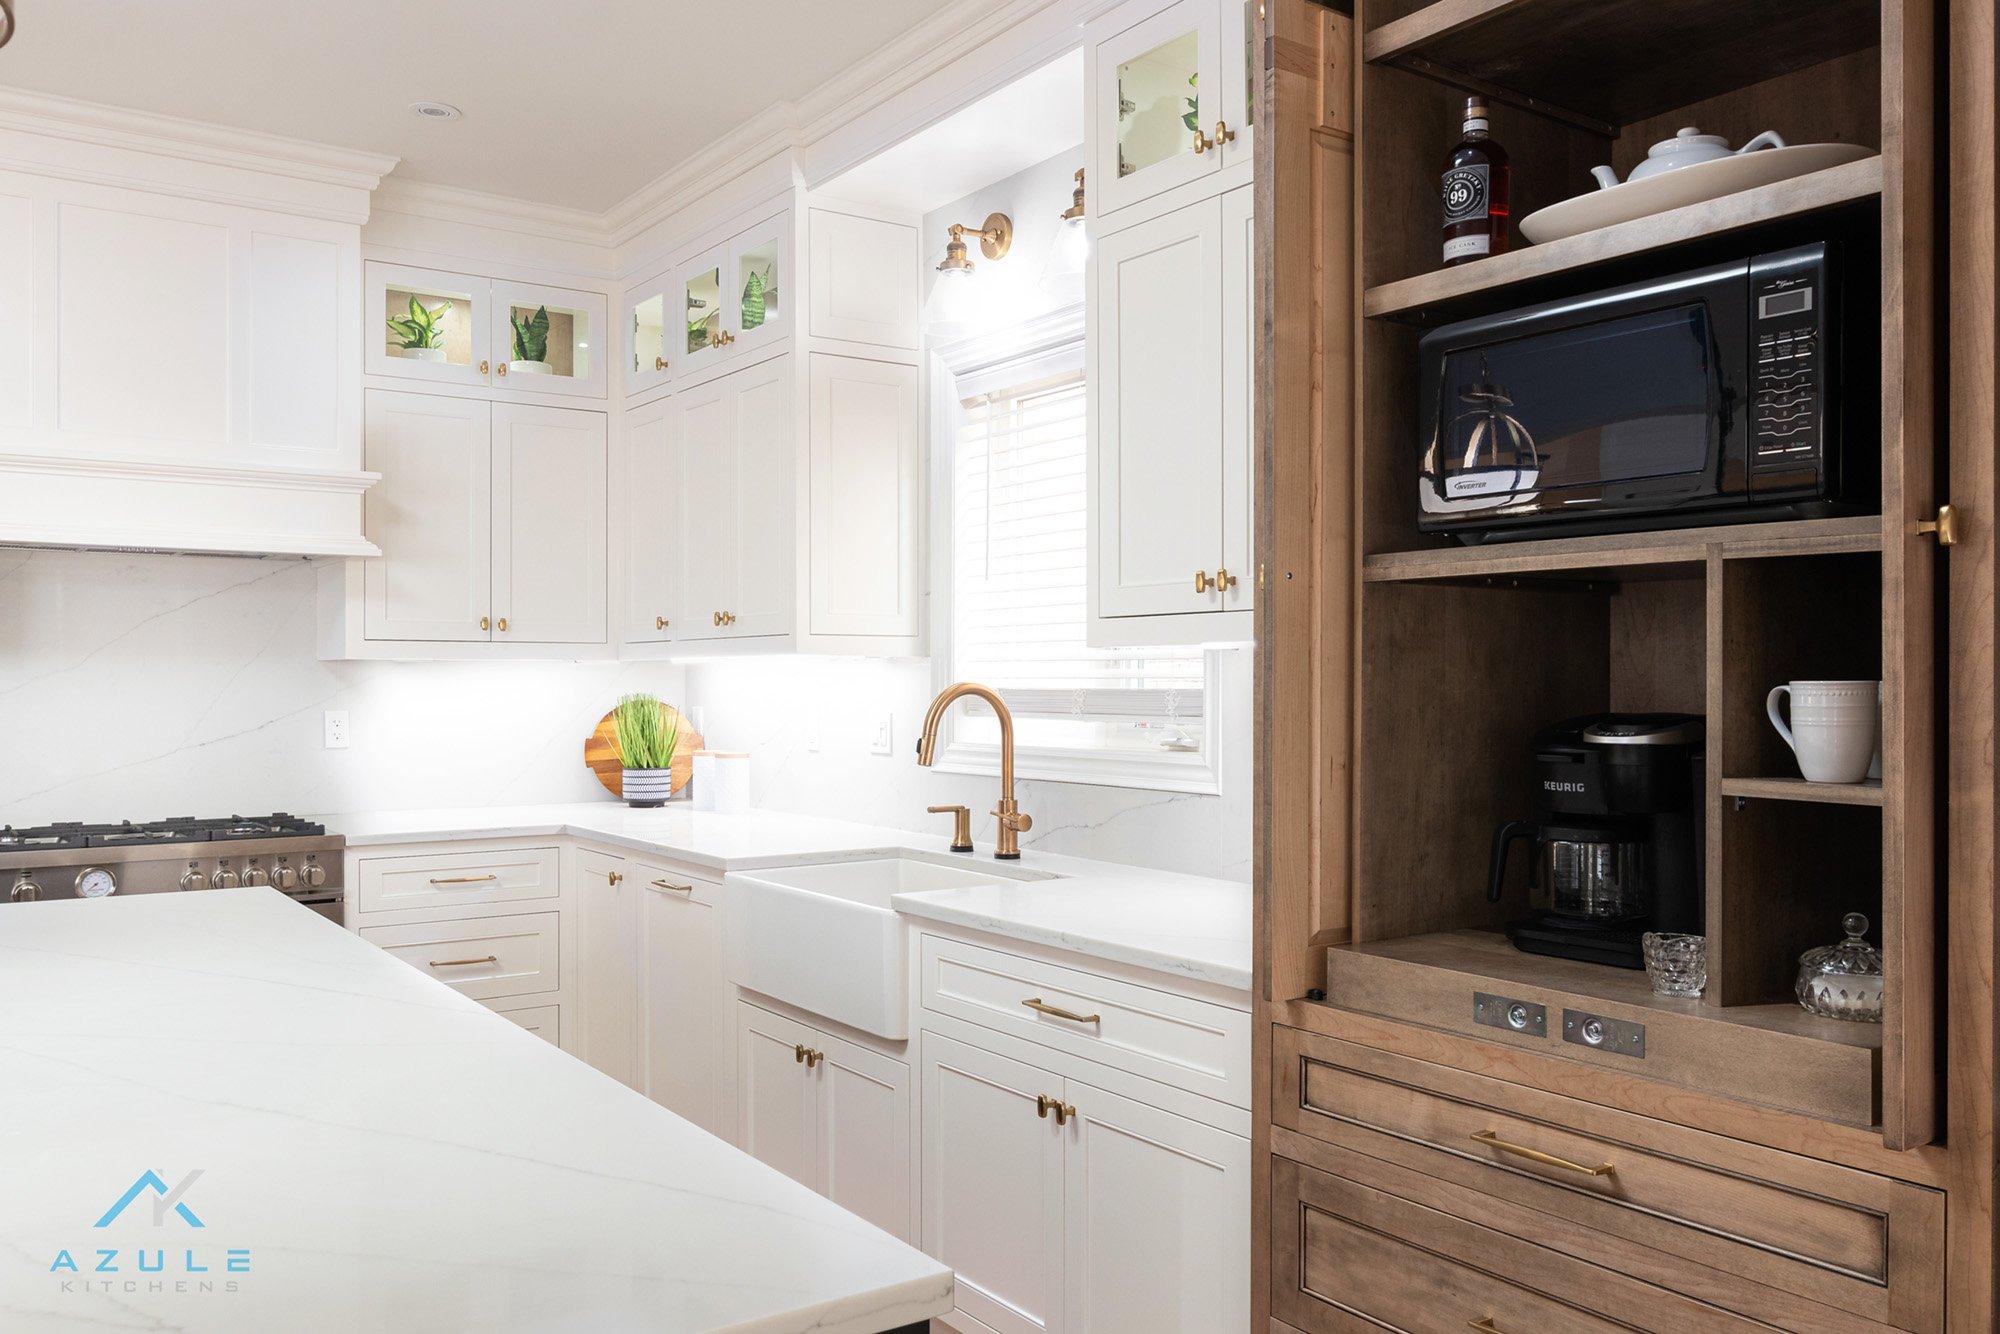 White Kitchen With Shaker Door Syle Azule Kitchens